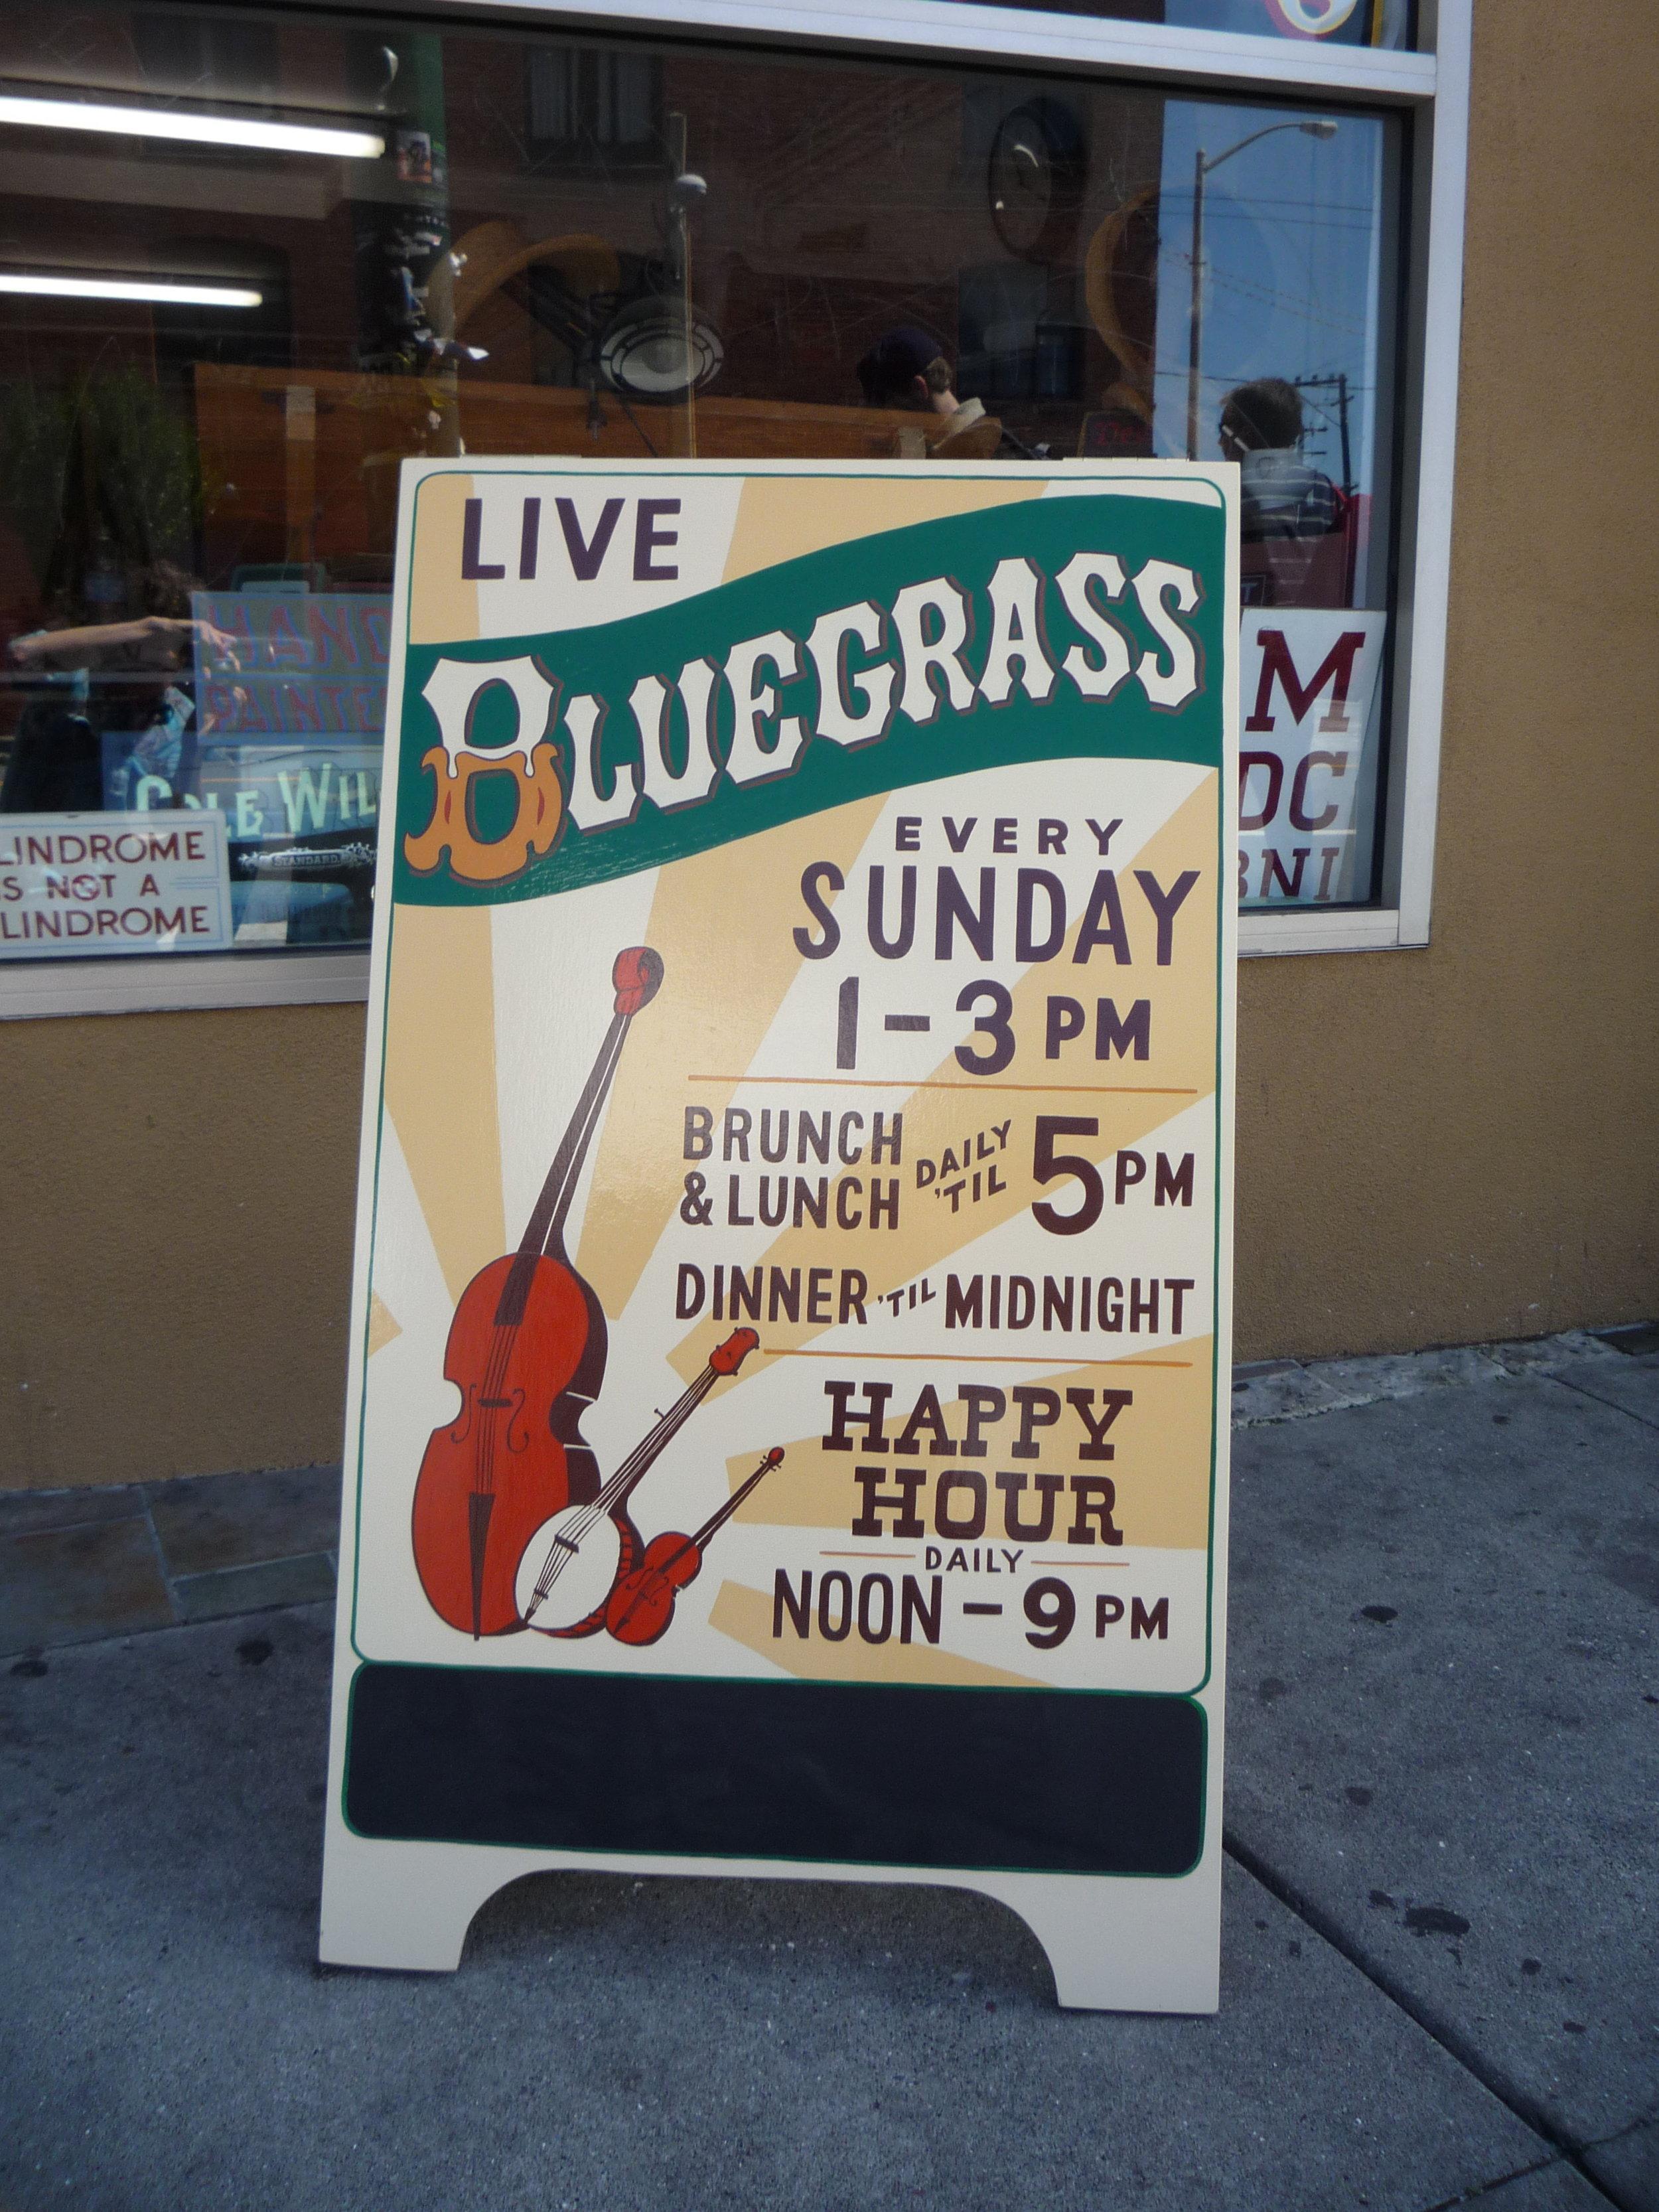 ORIG-live-bluegrass-at-the-buckshot-bar_4746995943_o.jpg